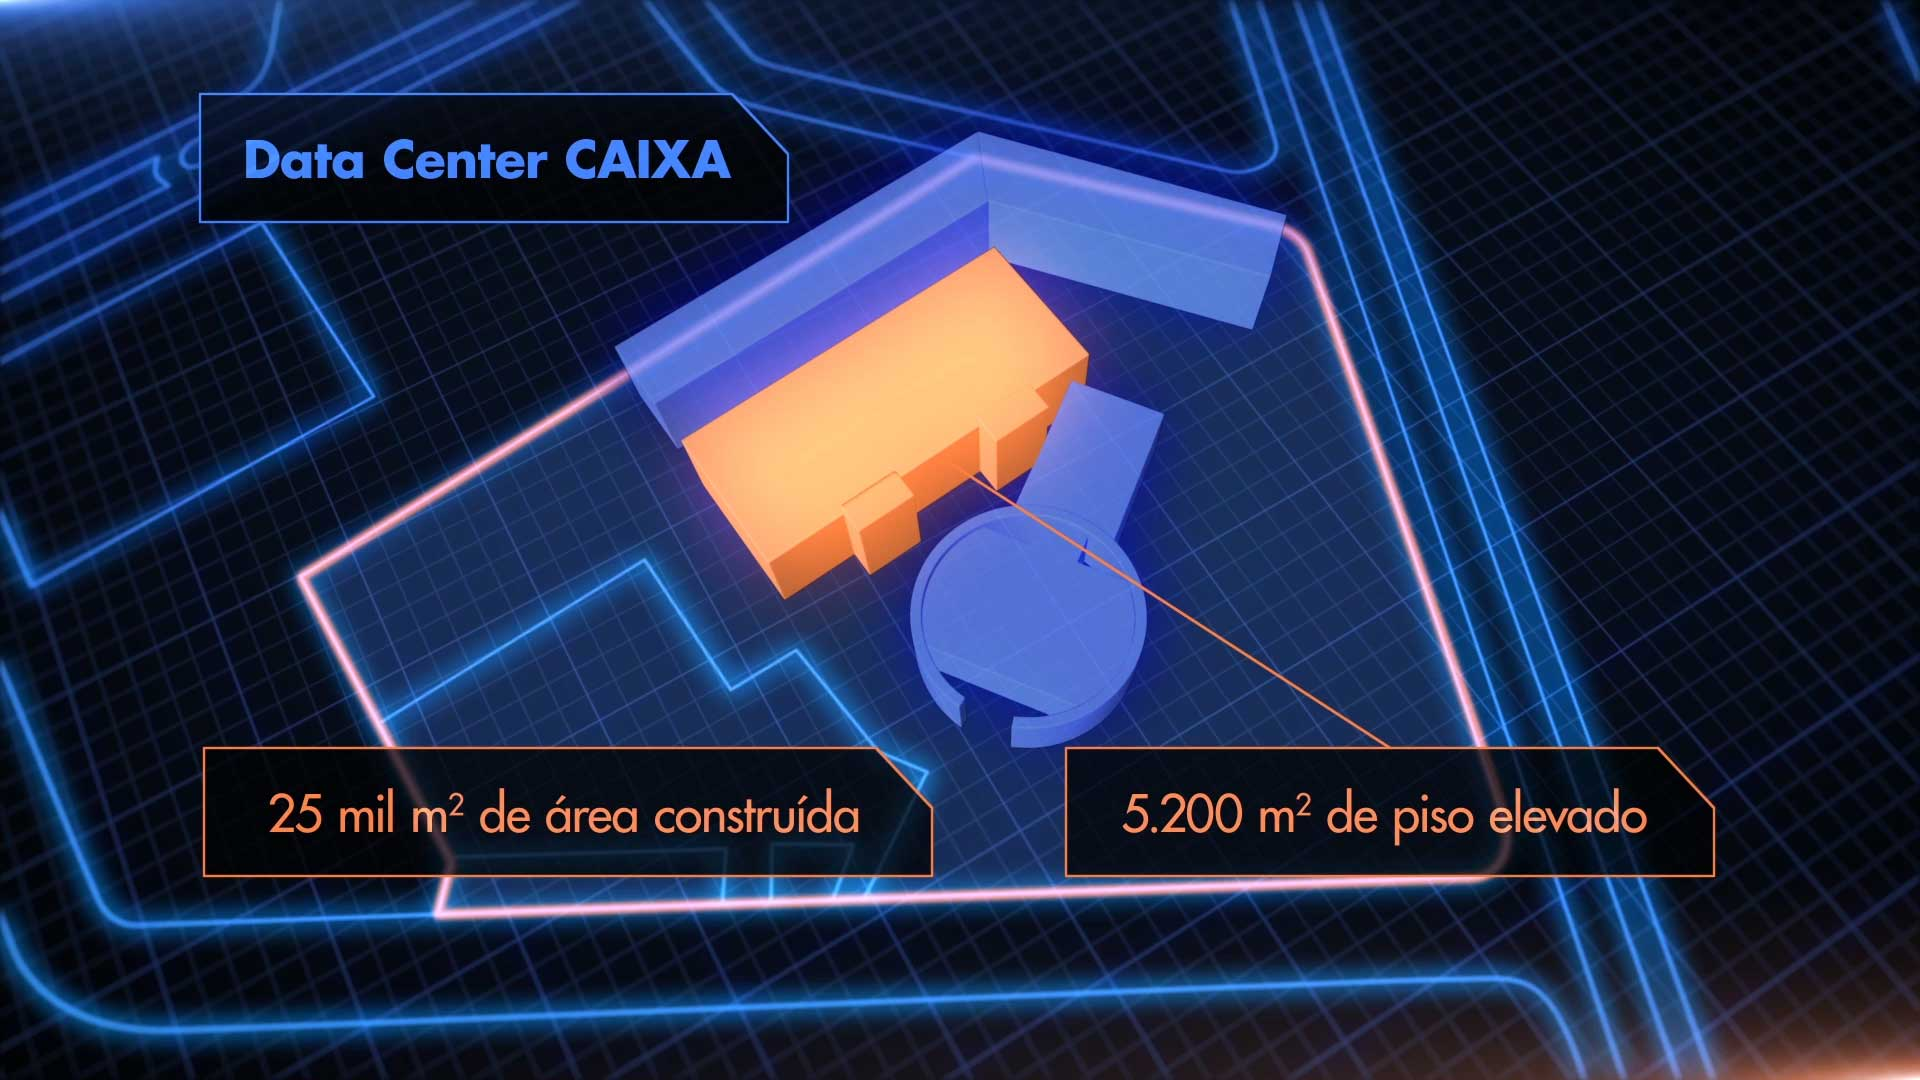 Datacenter Caixa